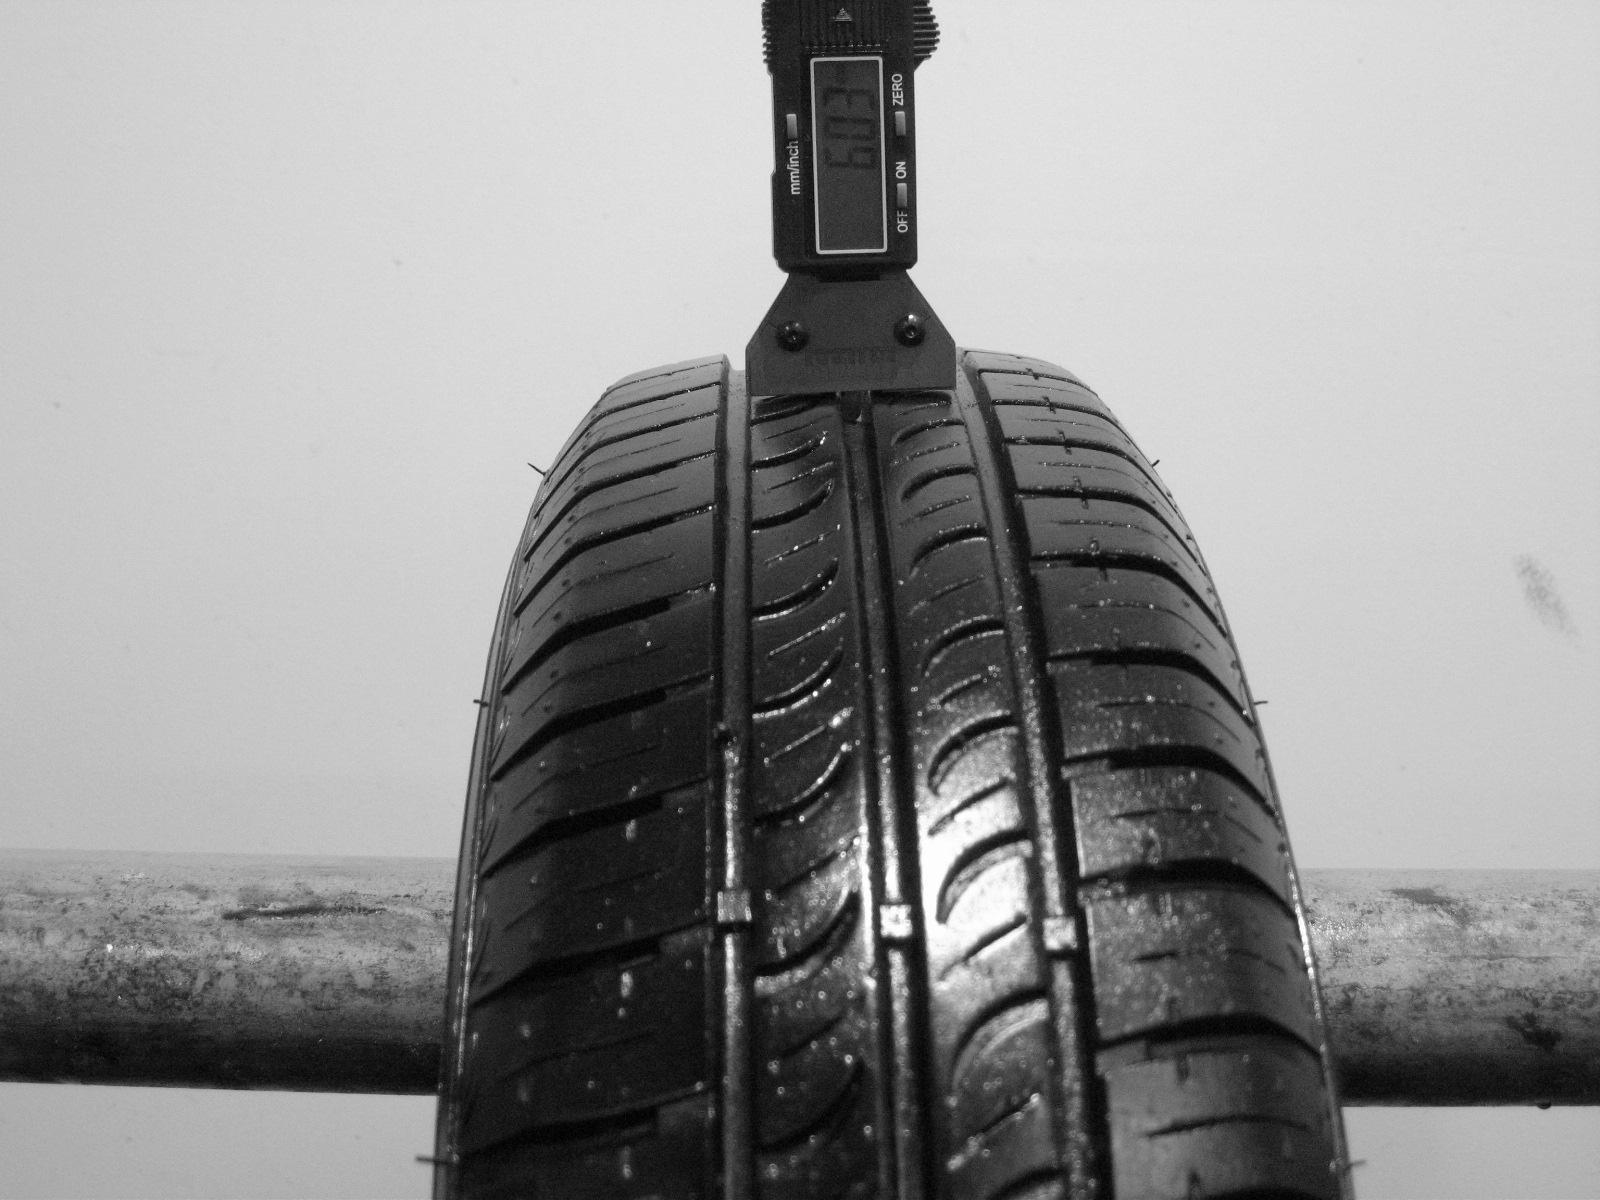 Použité-Pneu-Bazar - 165/80 R13 HANKOOK OPTIMO K715 -kusovka-rezerva 3mm